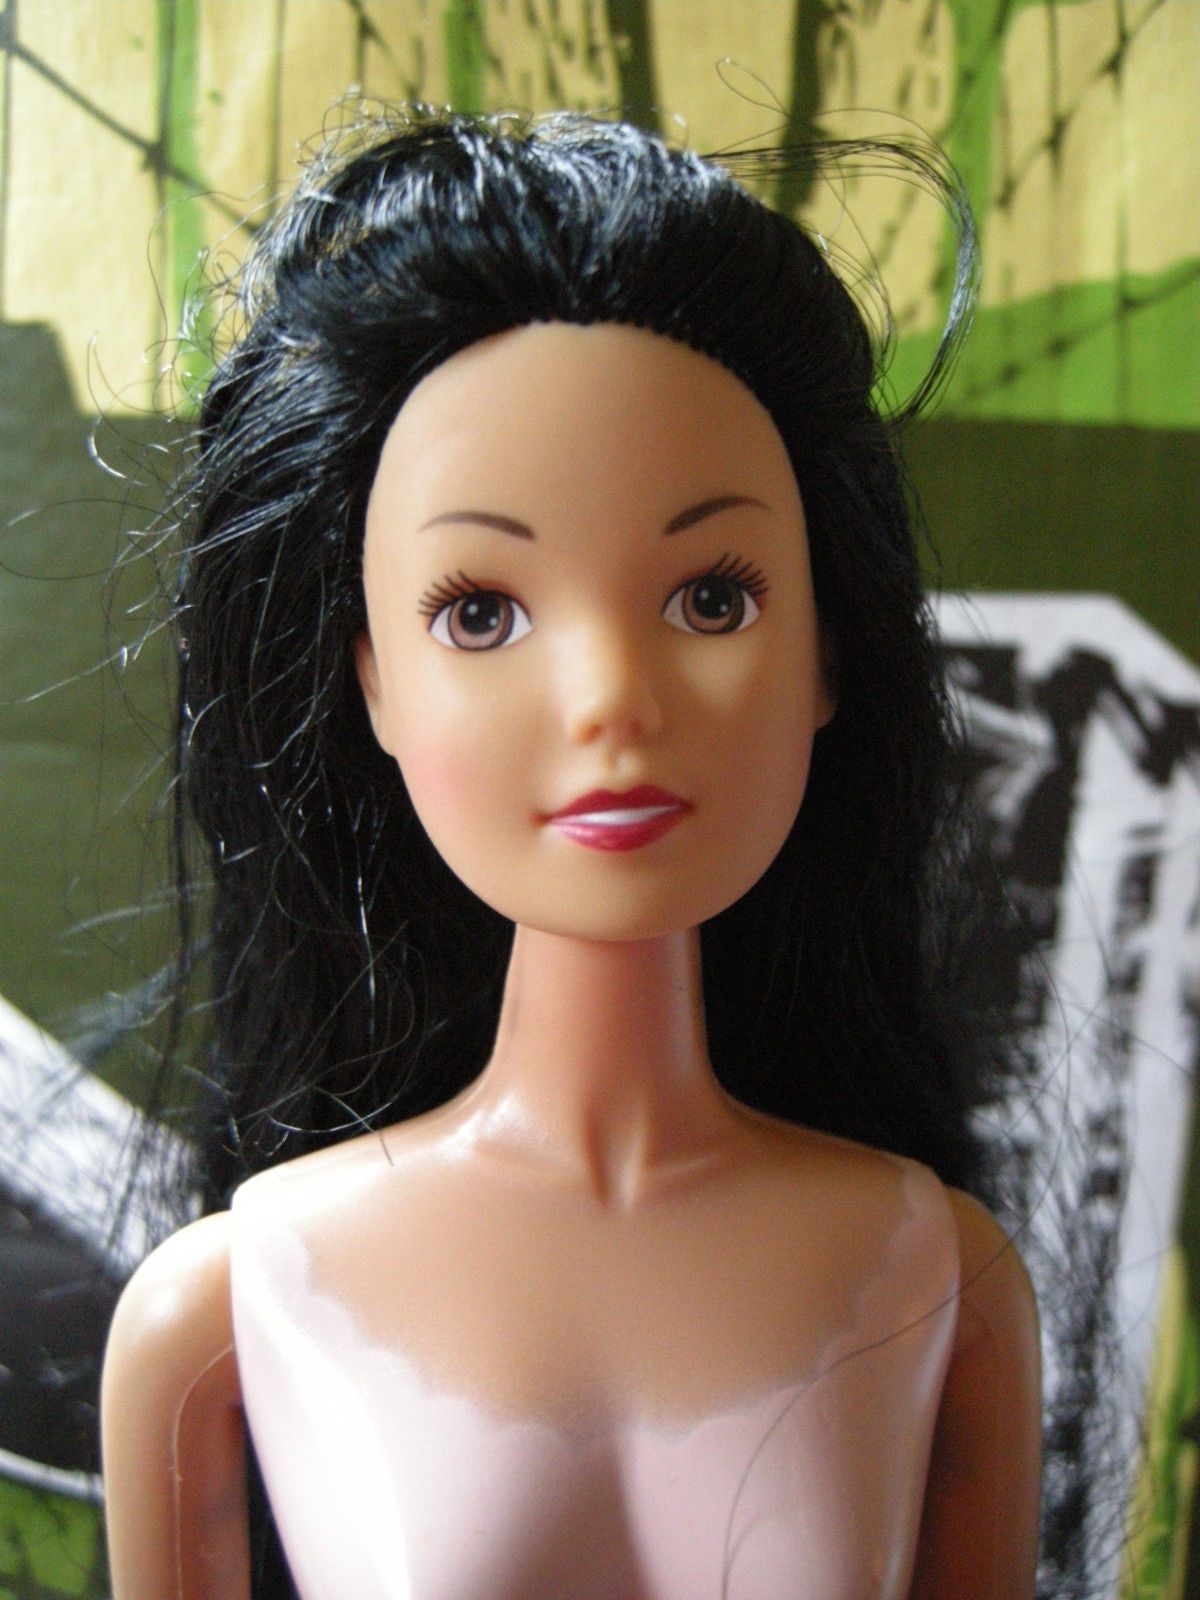 amazing indians nude Amazing Barbie Doll Nude Simba Hindu Bride Indian Black Hair Pale Skin  Beautiful - with Mehndi